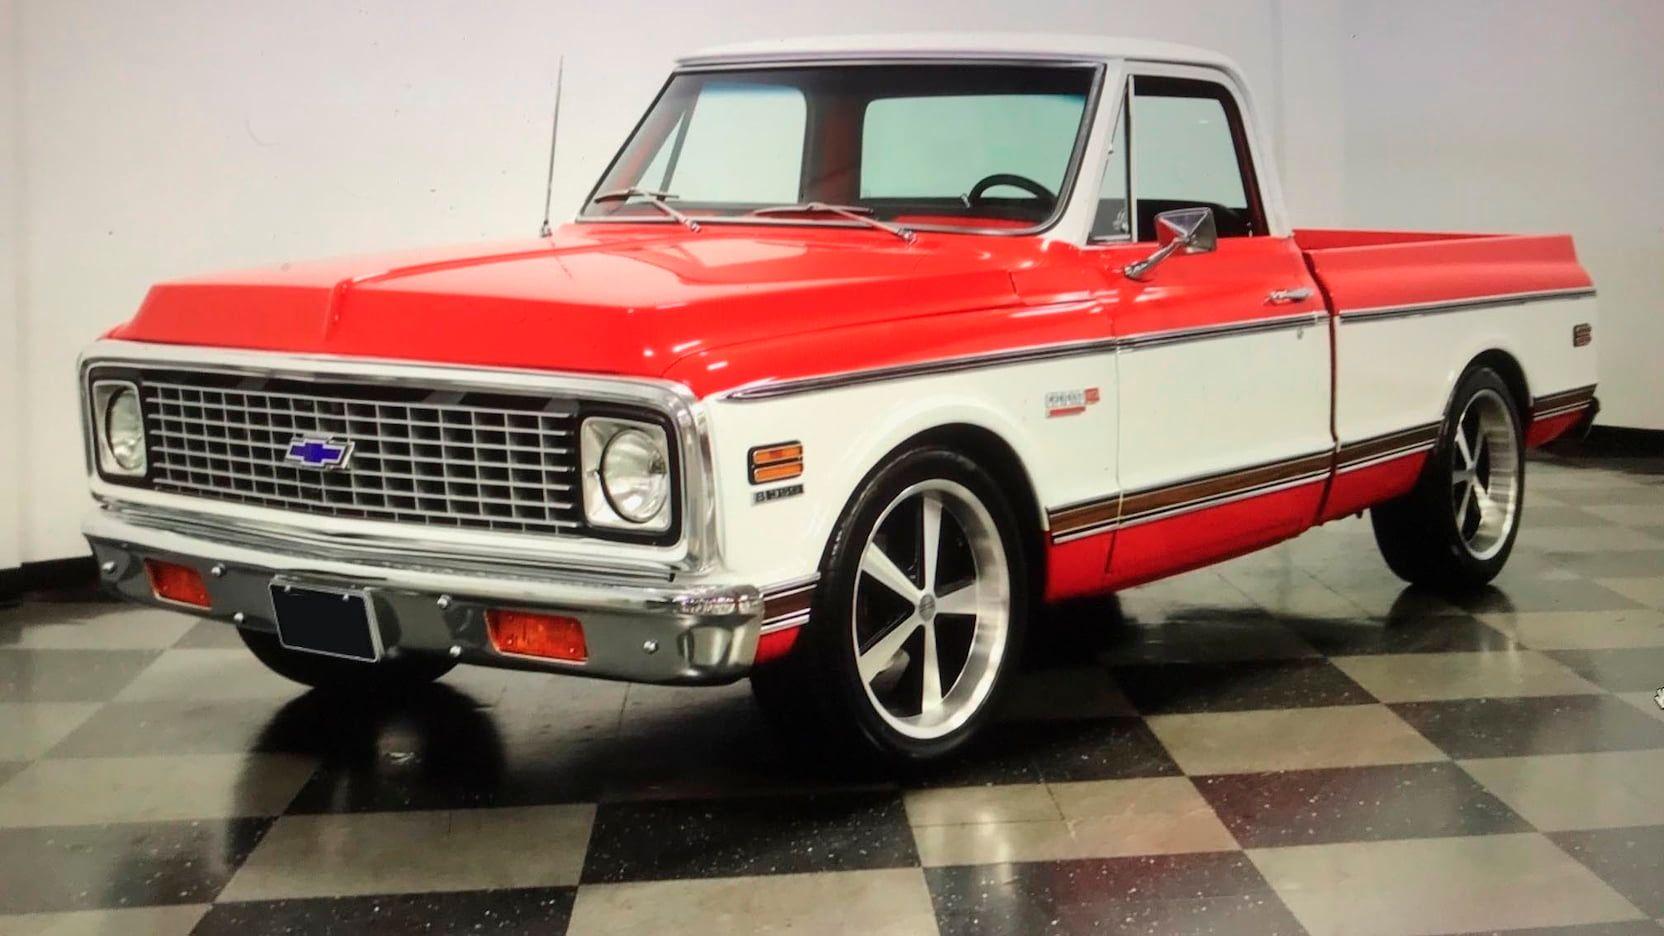 1972 Chevrolet Resto Mod Pickup